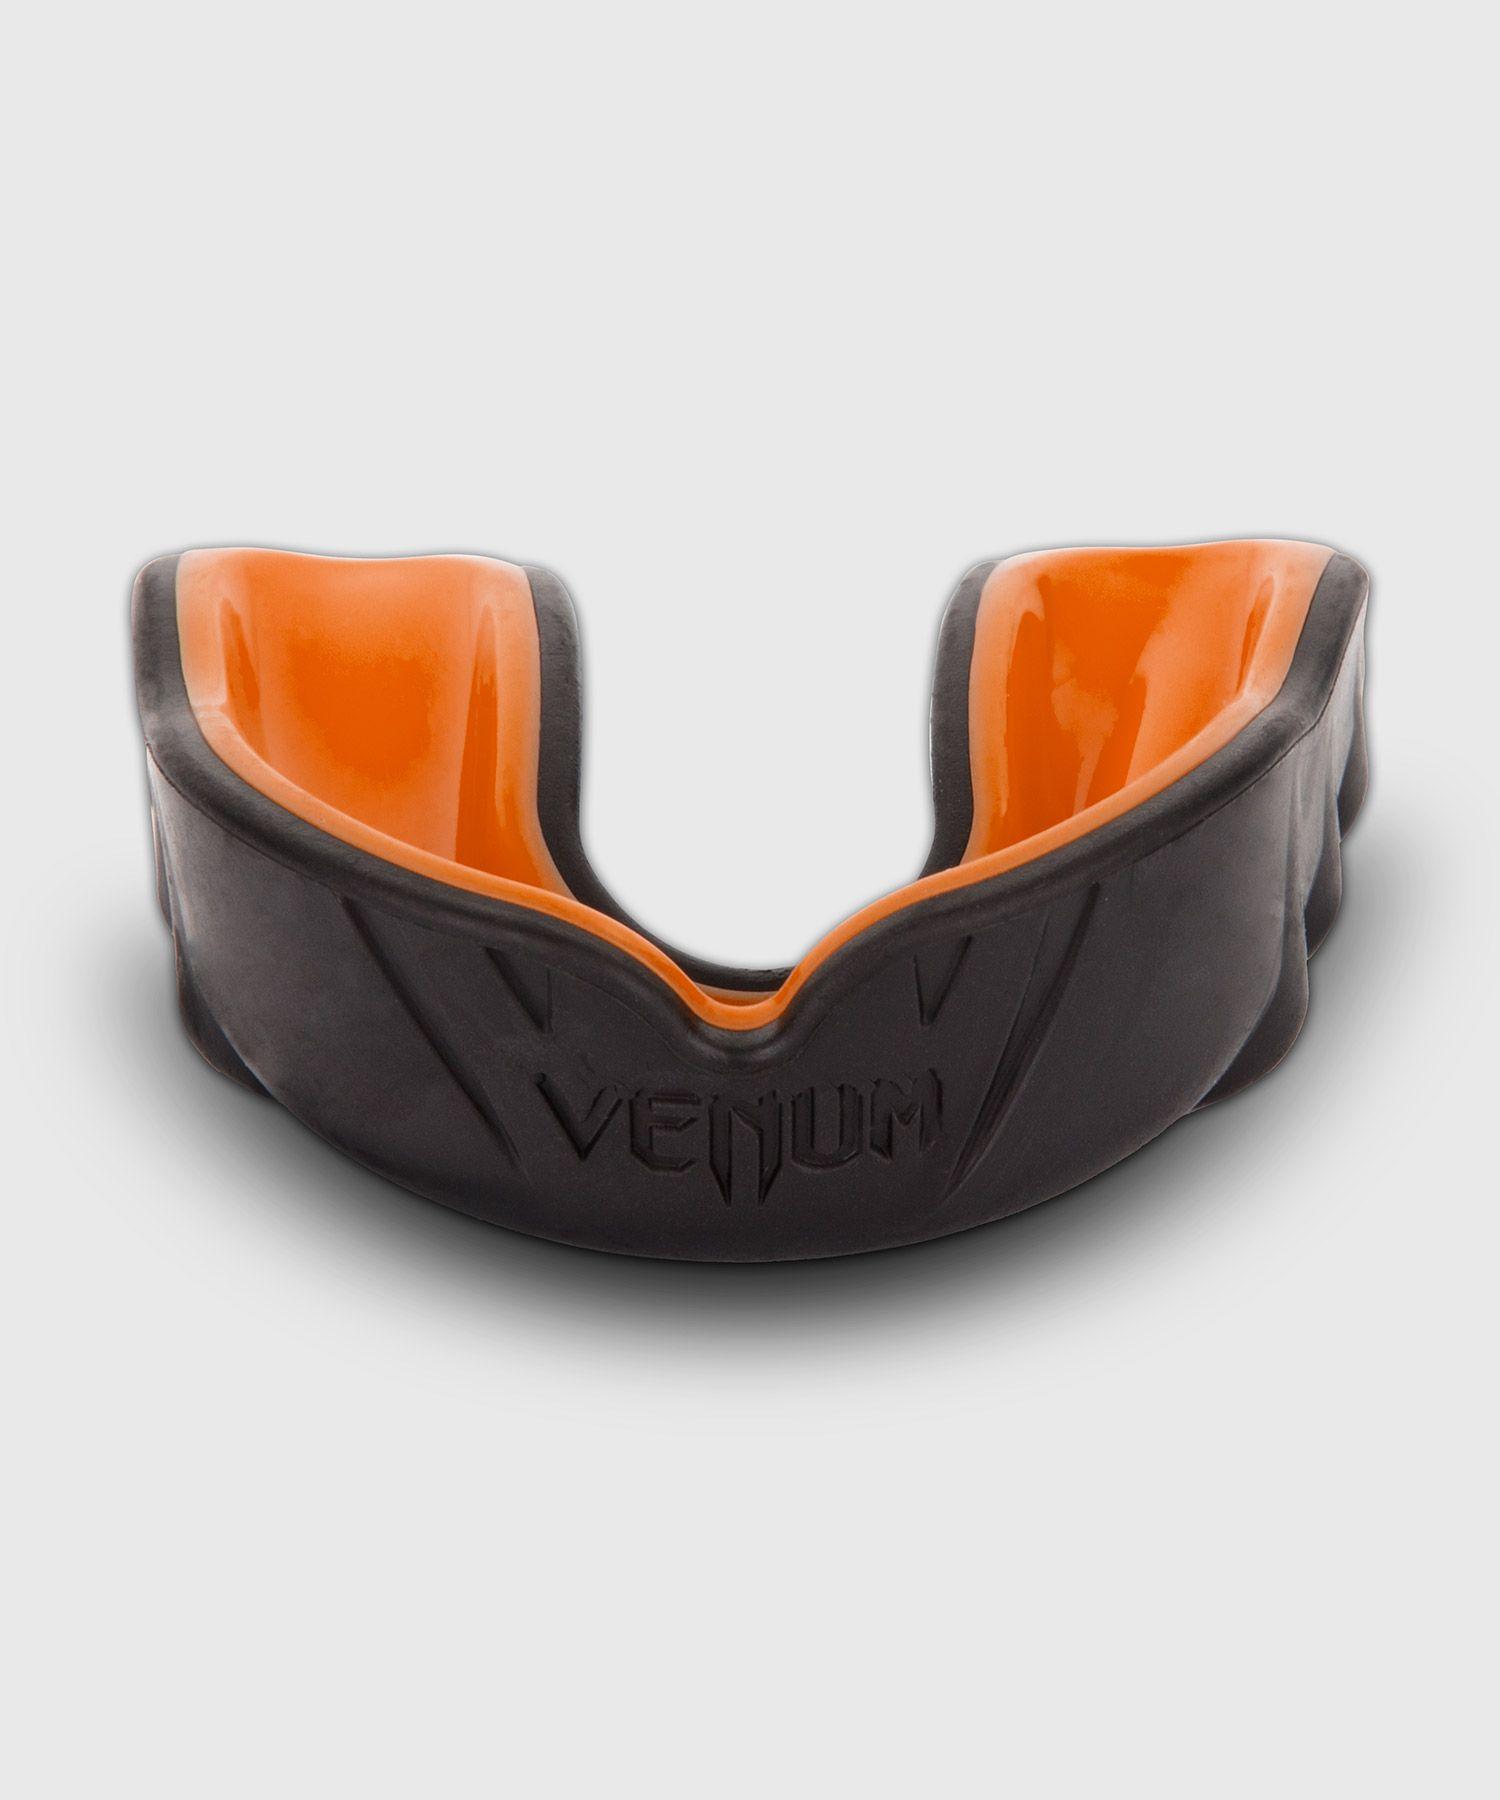 Paradenti Venum Challenger - Nero/Arancione